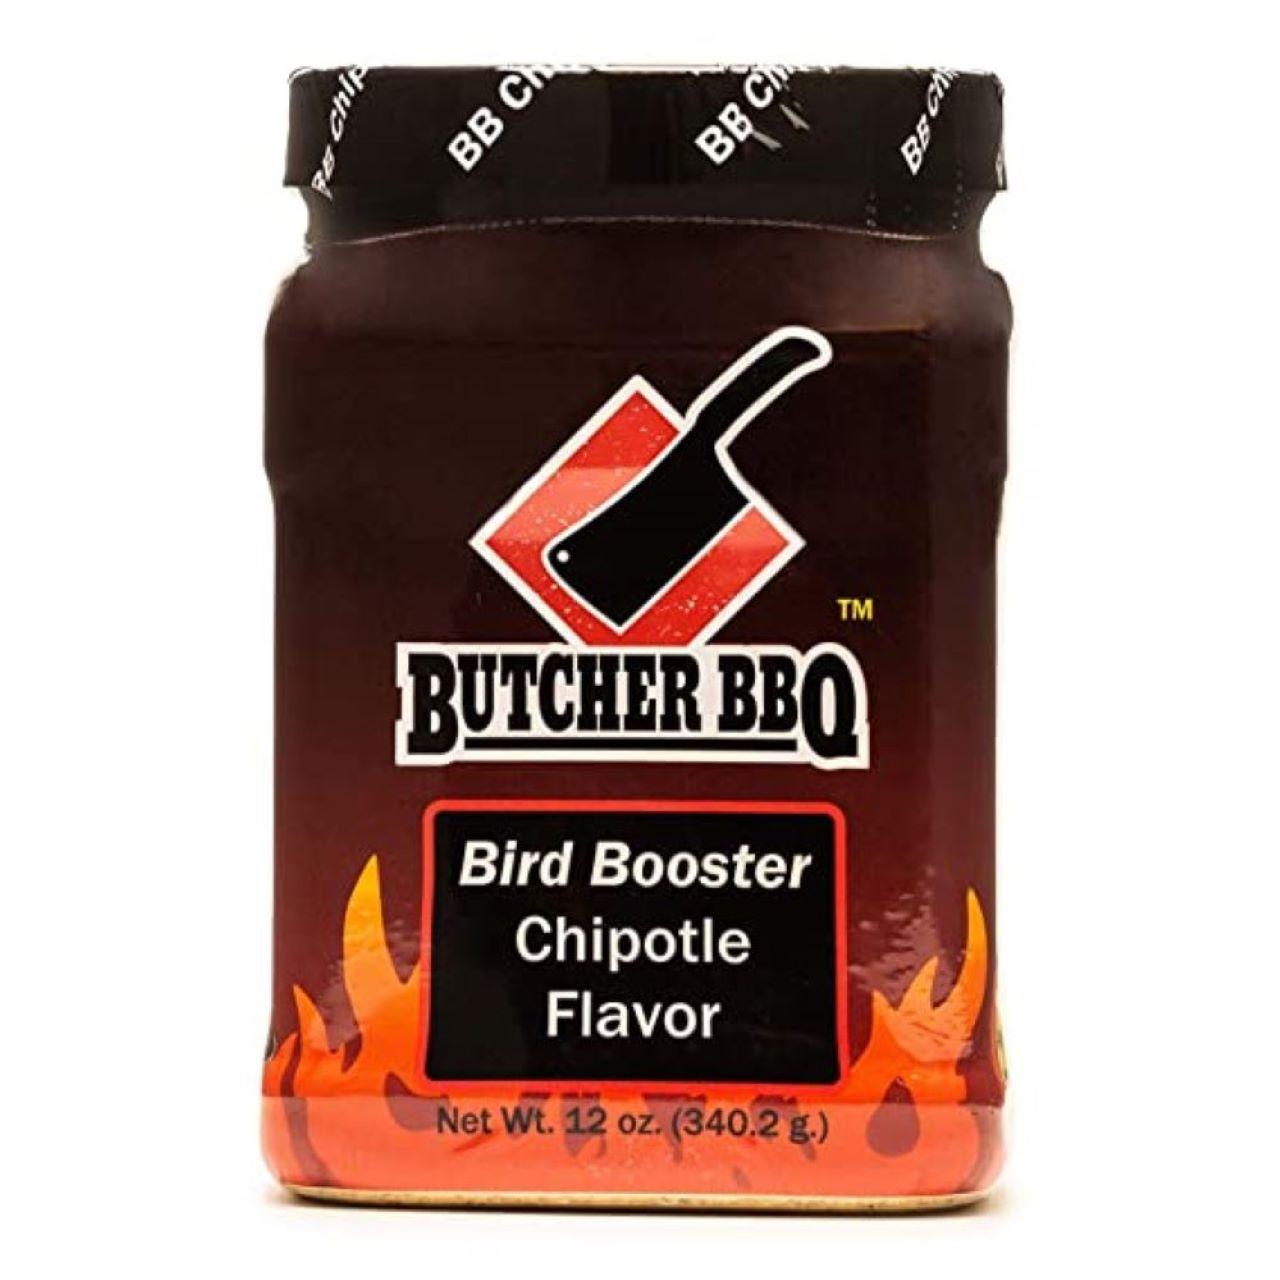 Butcher BBQ 12oz Bird Booster Chipotle Flavor Powder Injection Marinade